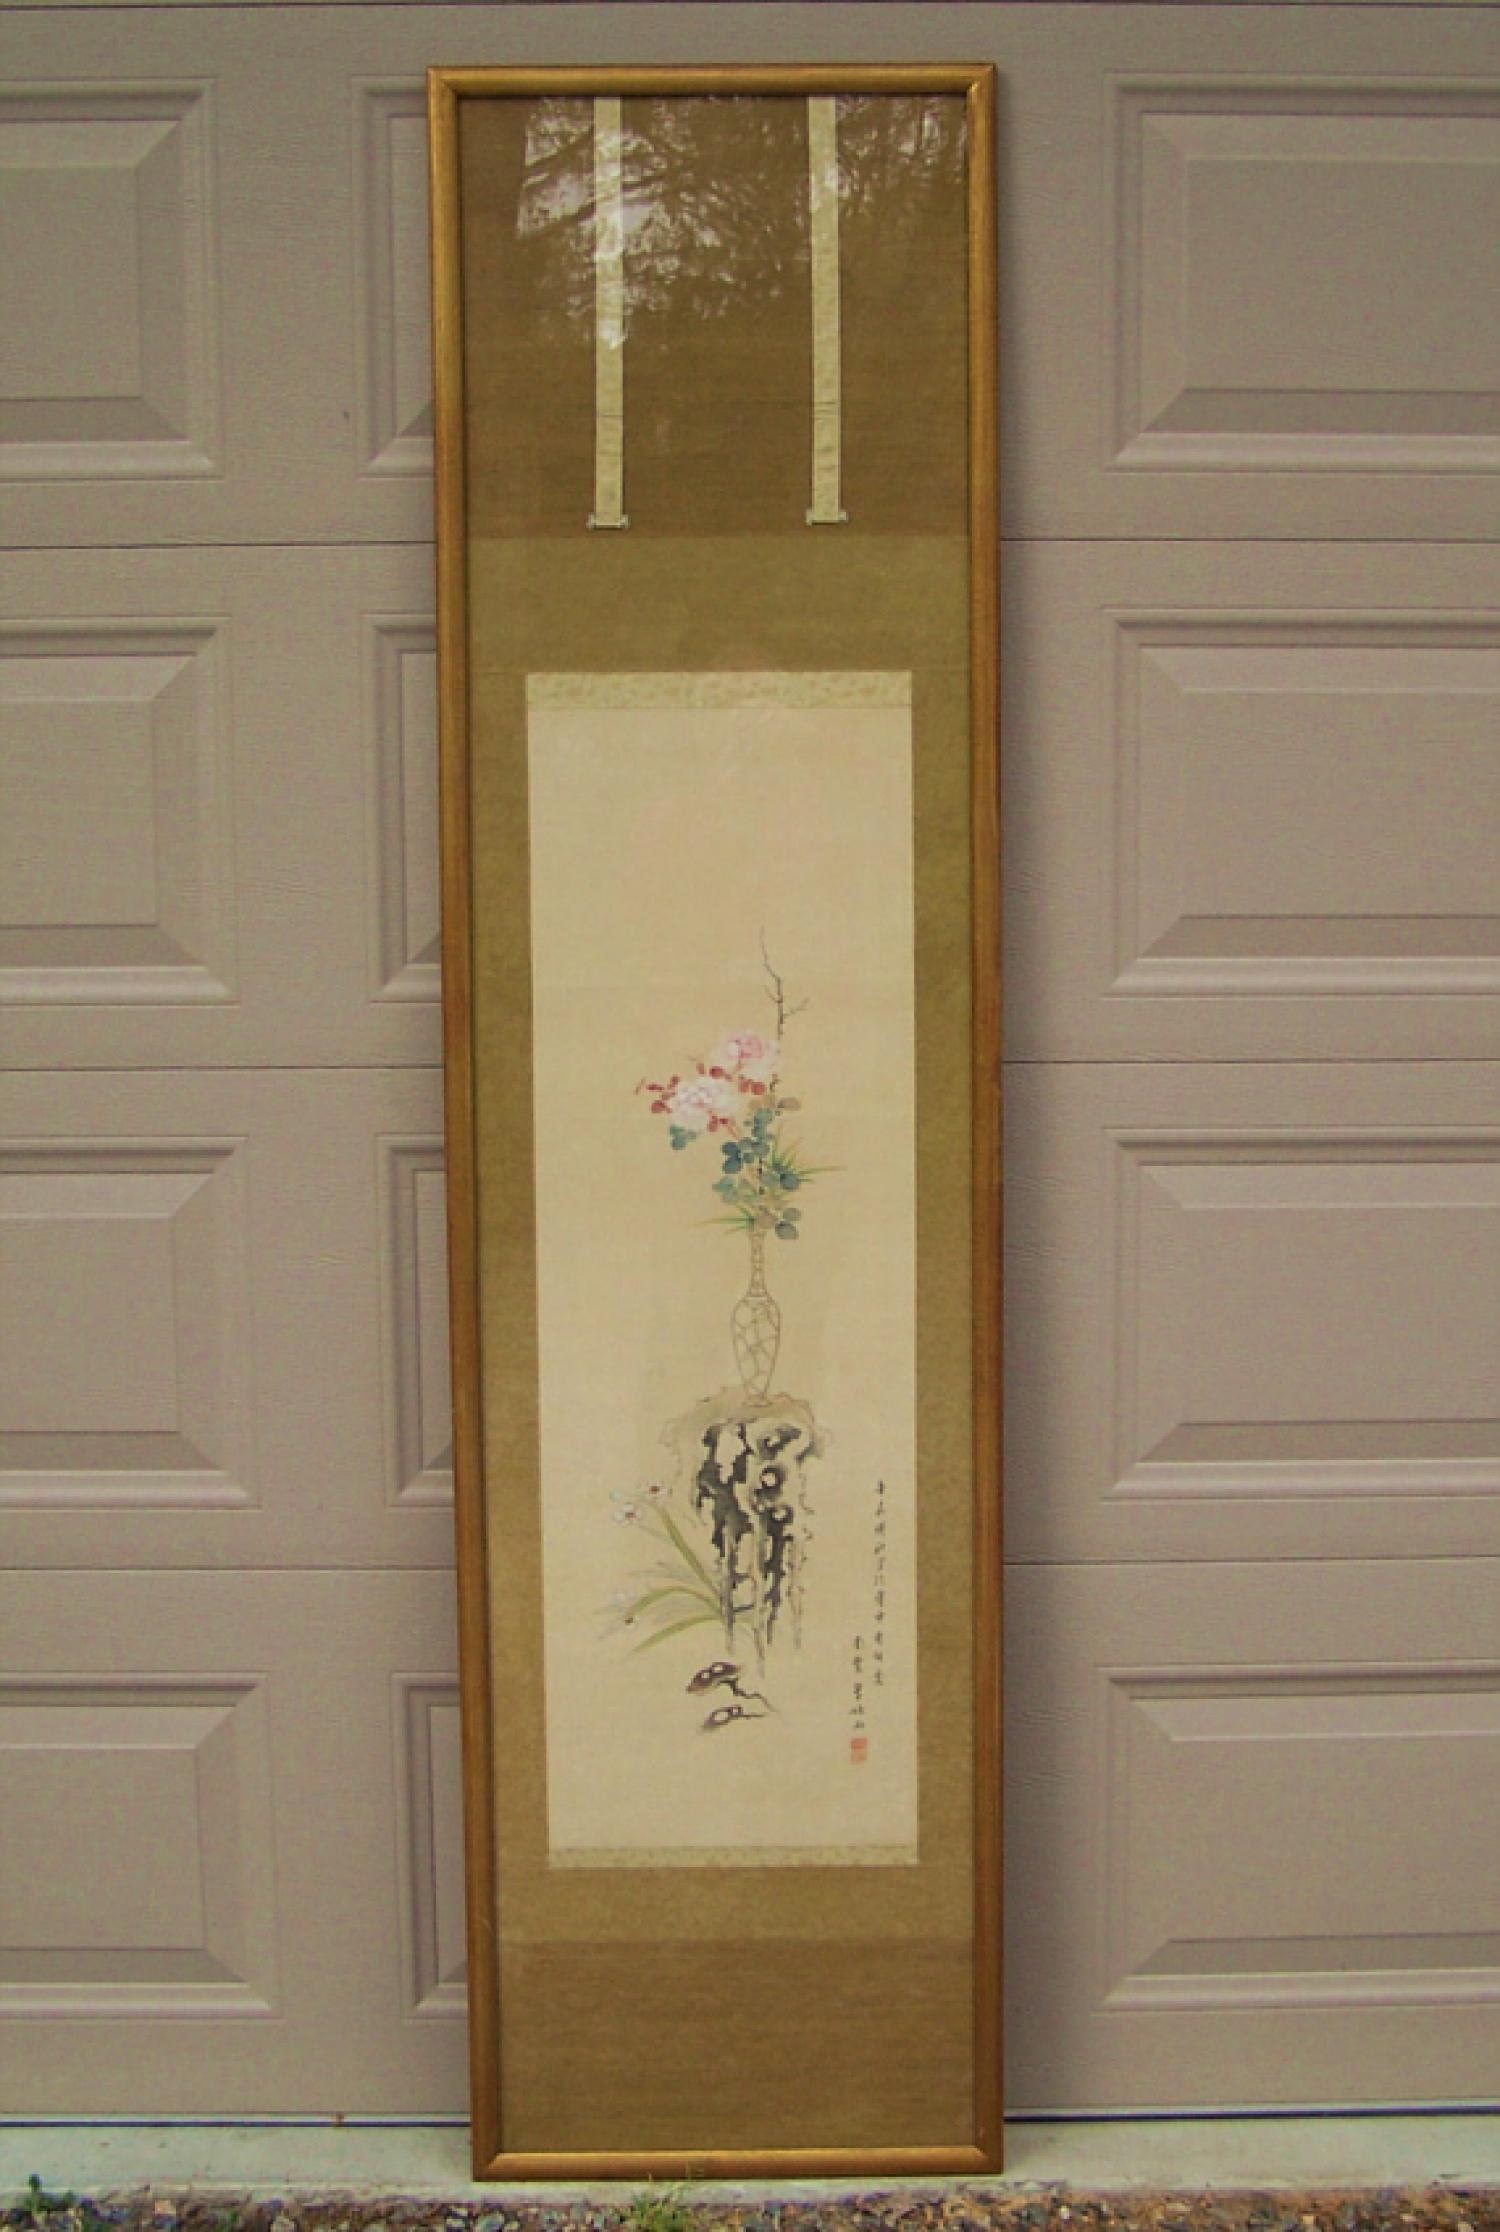 19th century Japanese silk scroll